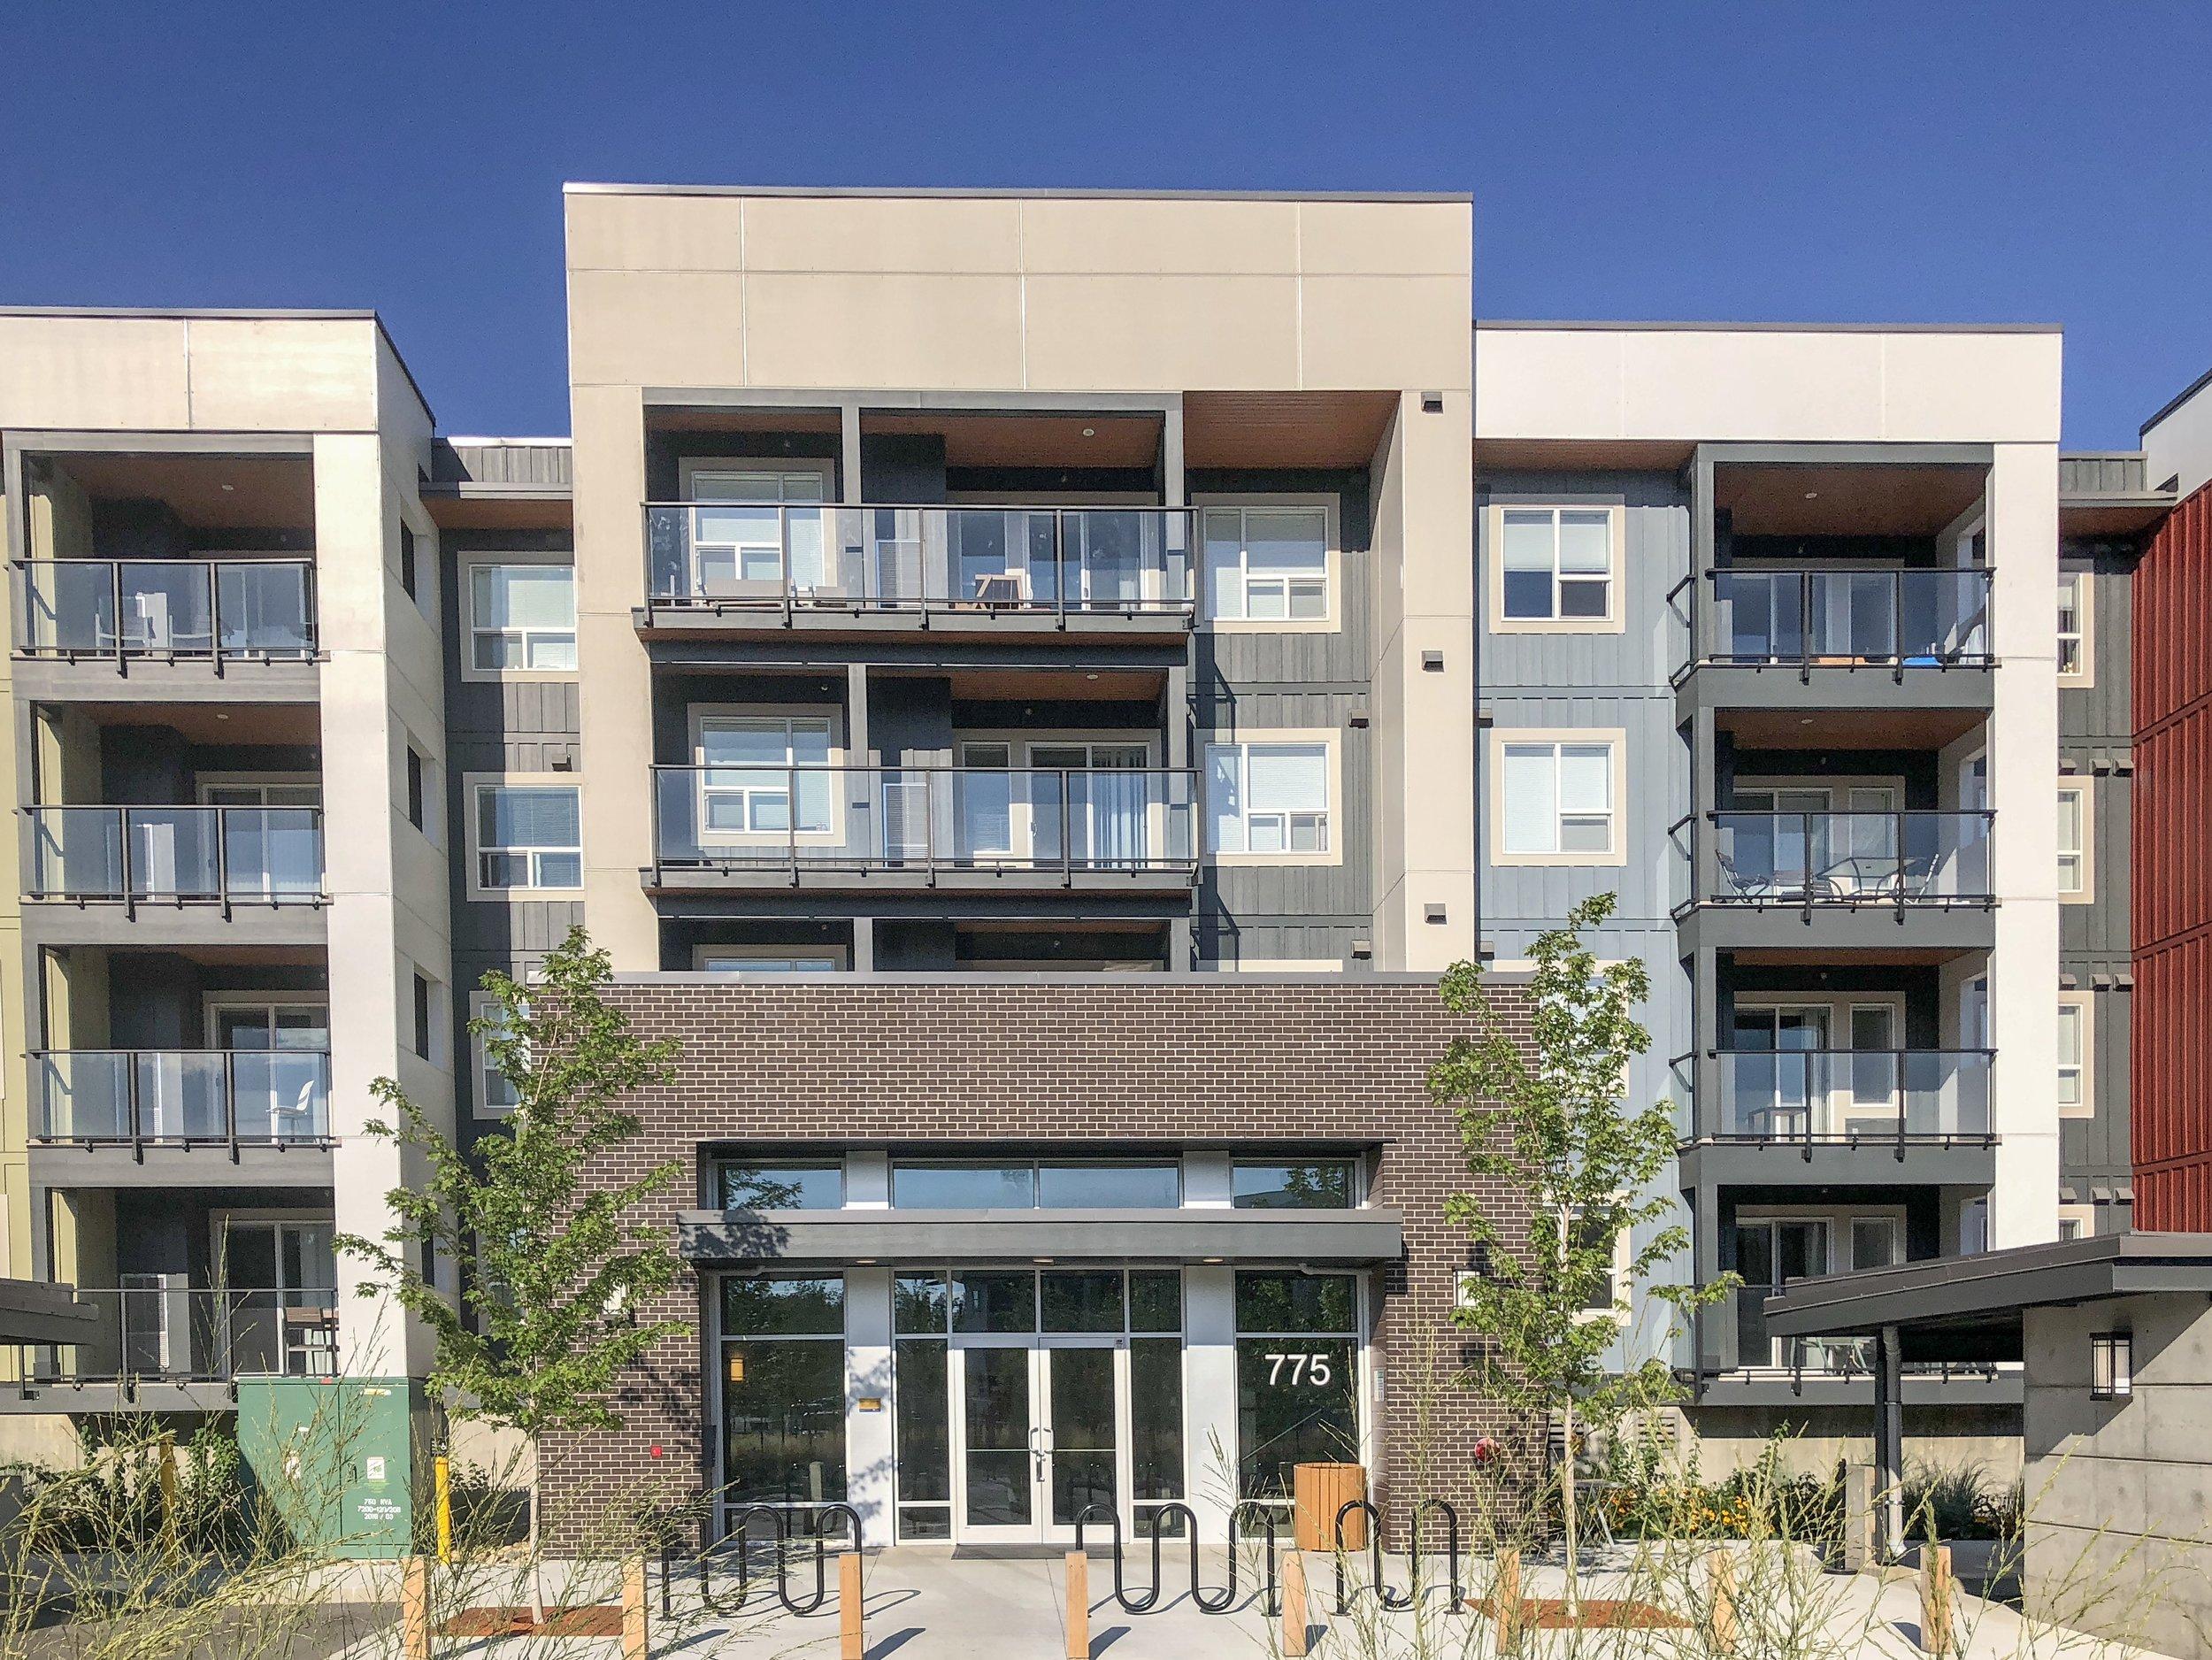 u-three-ubco-01-kelowna-investment-property.jpg